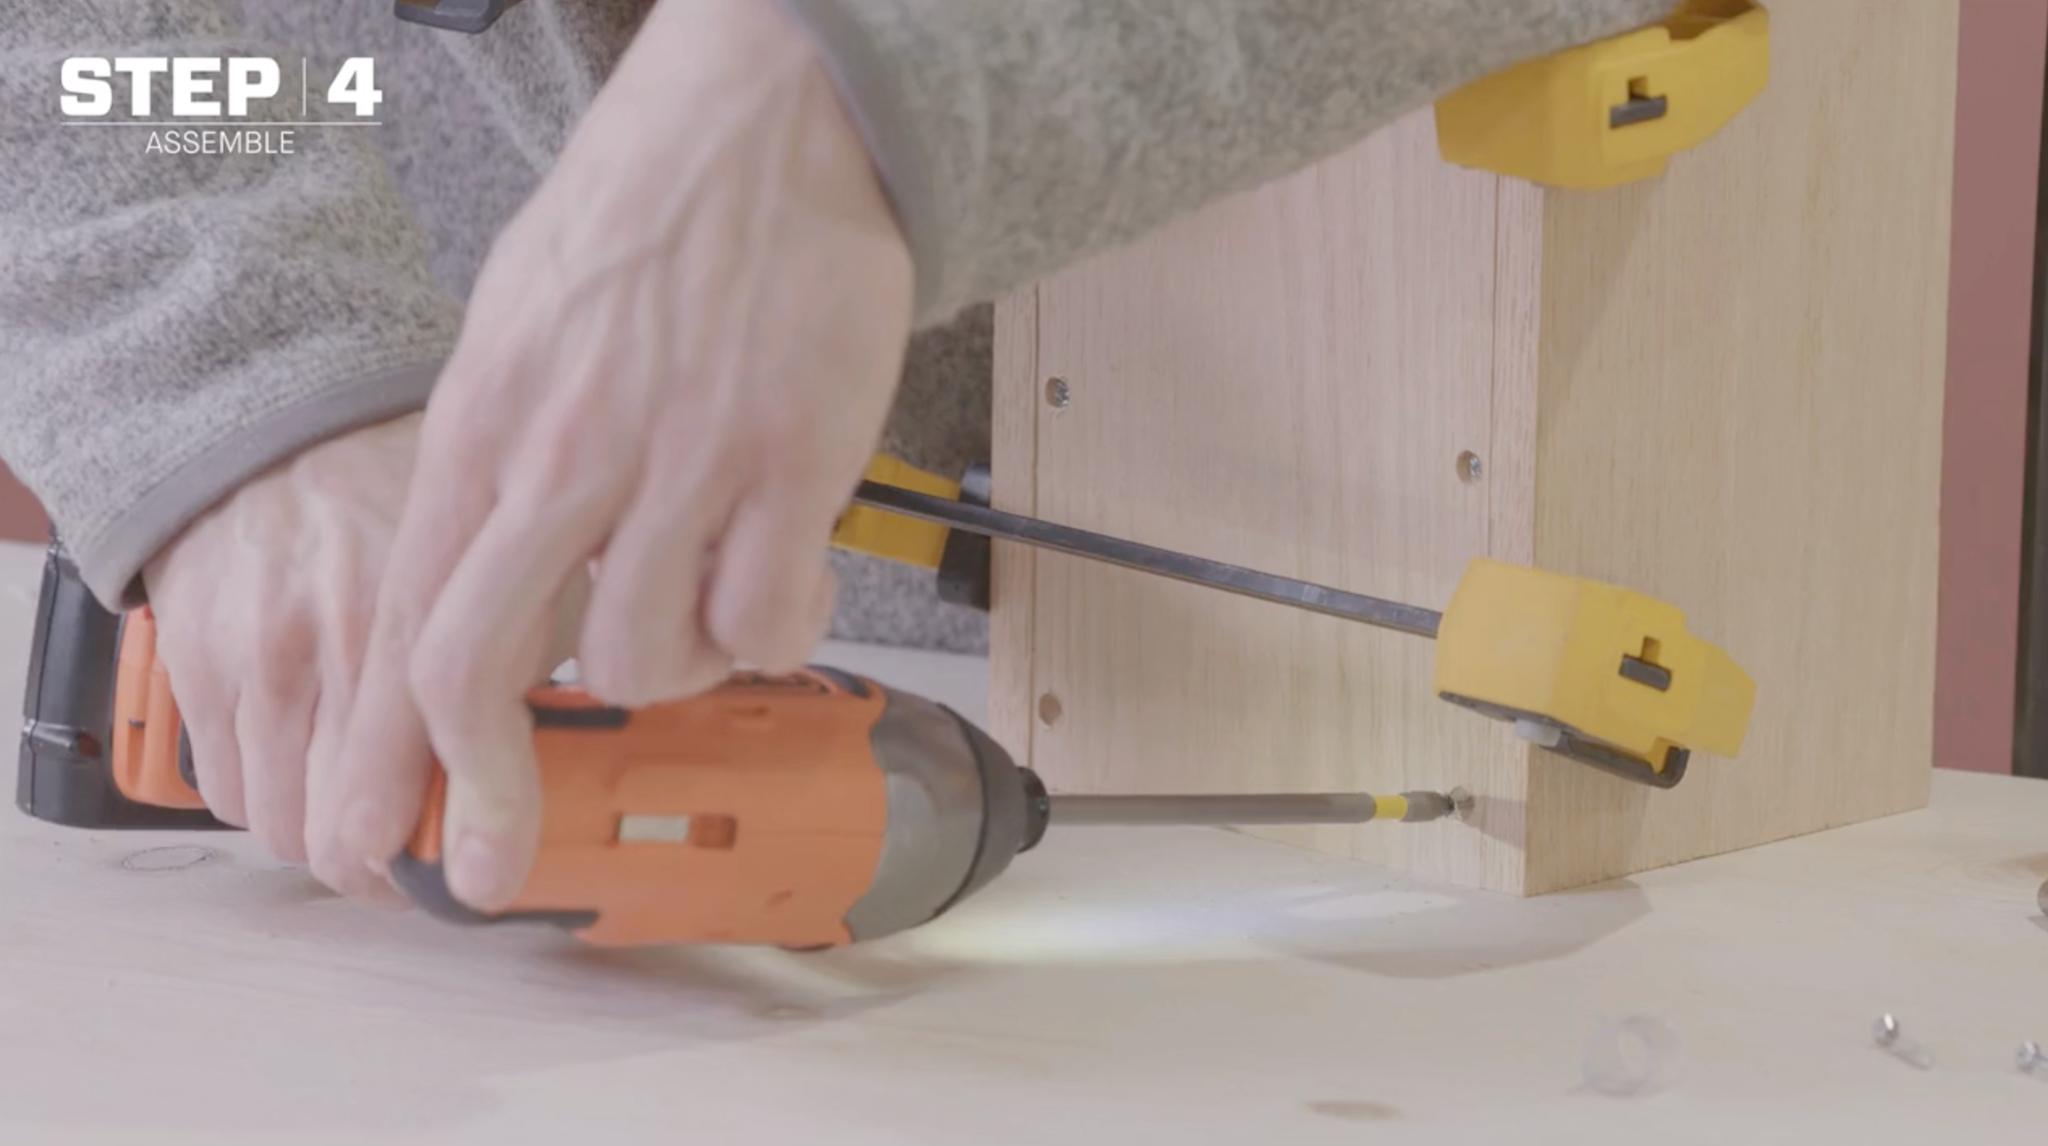 Assembling your DIY liquor dispenser